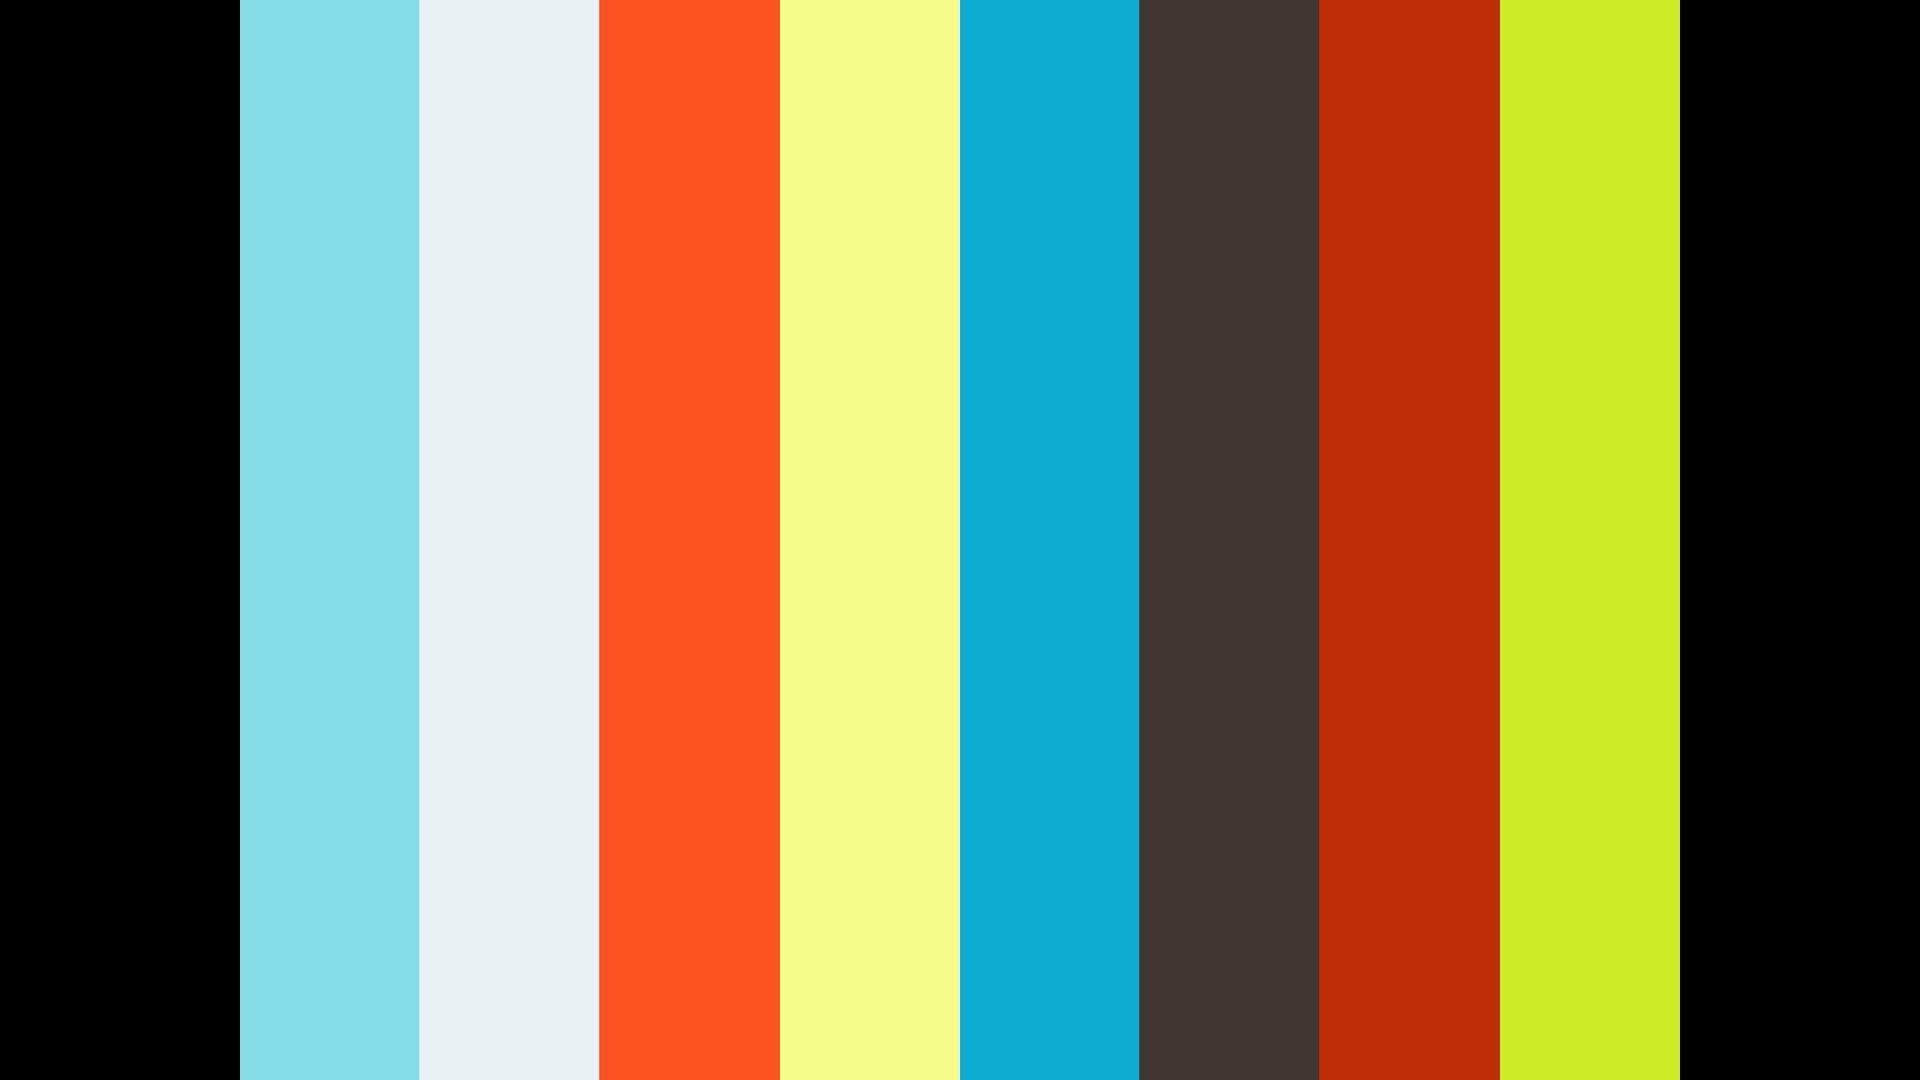 ACTU-AUTO EPISODE 1 - AUDI EN 2018